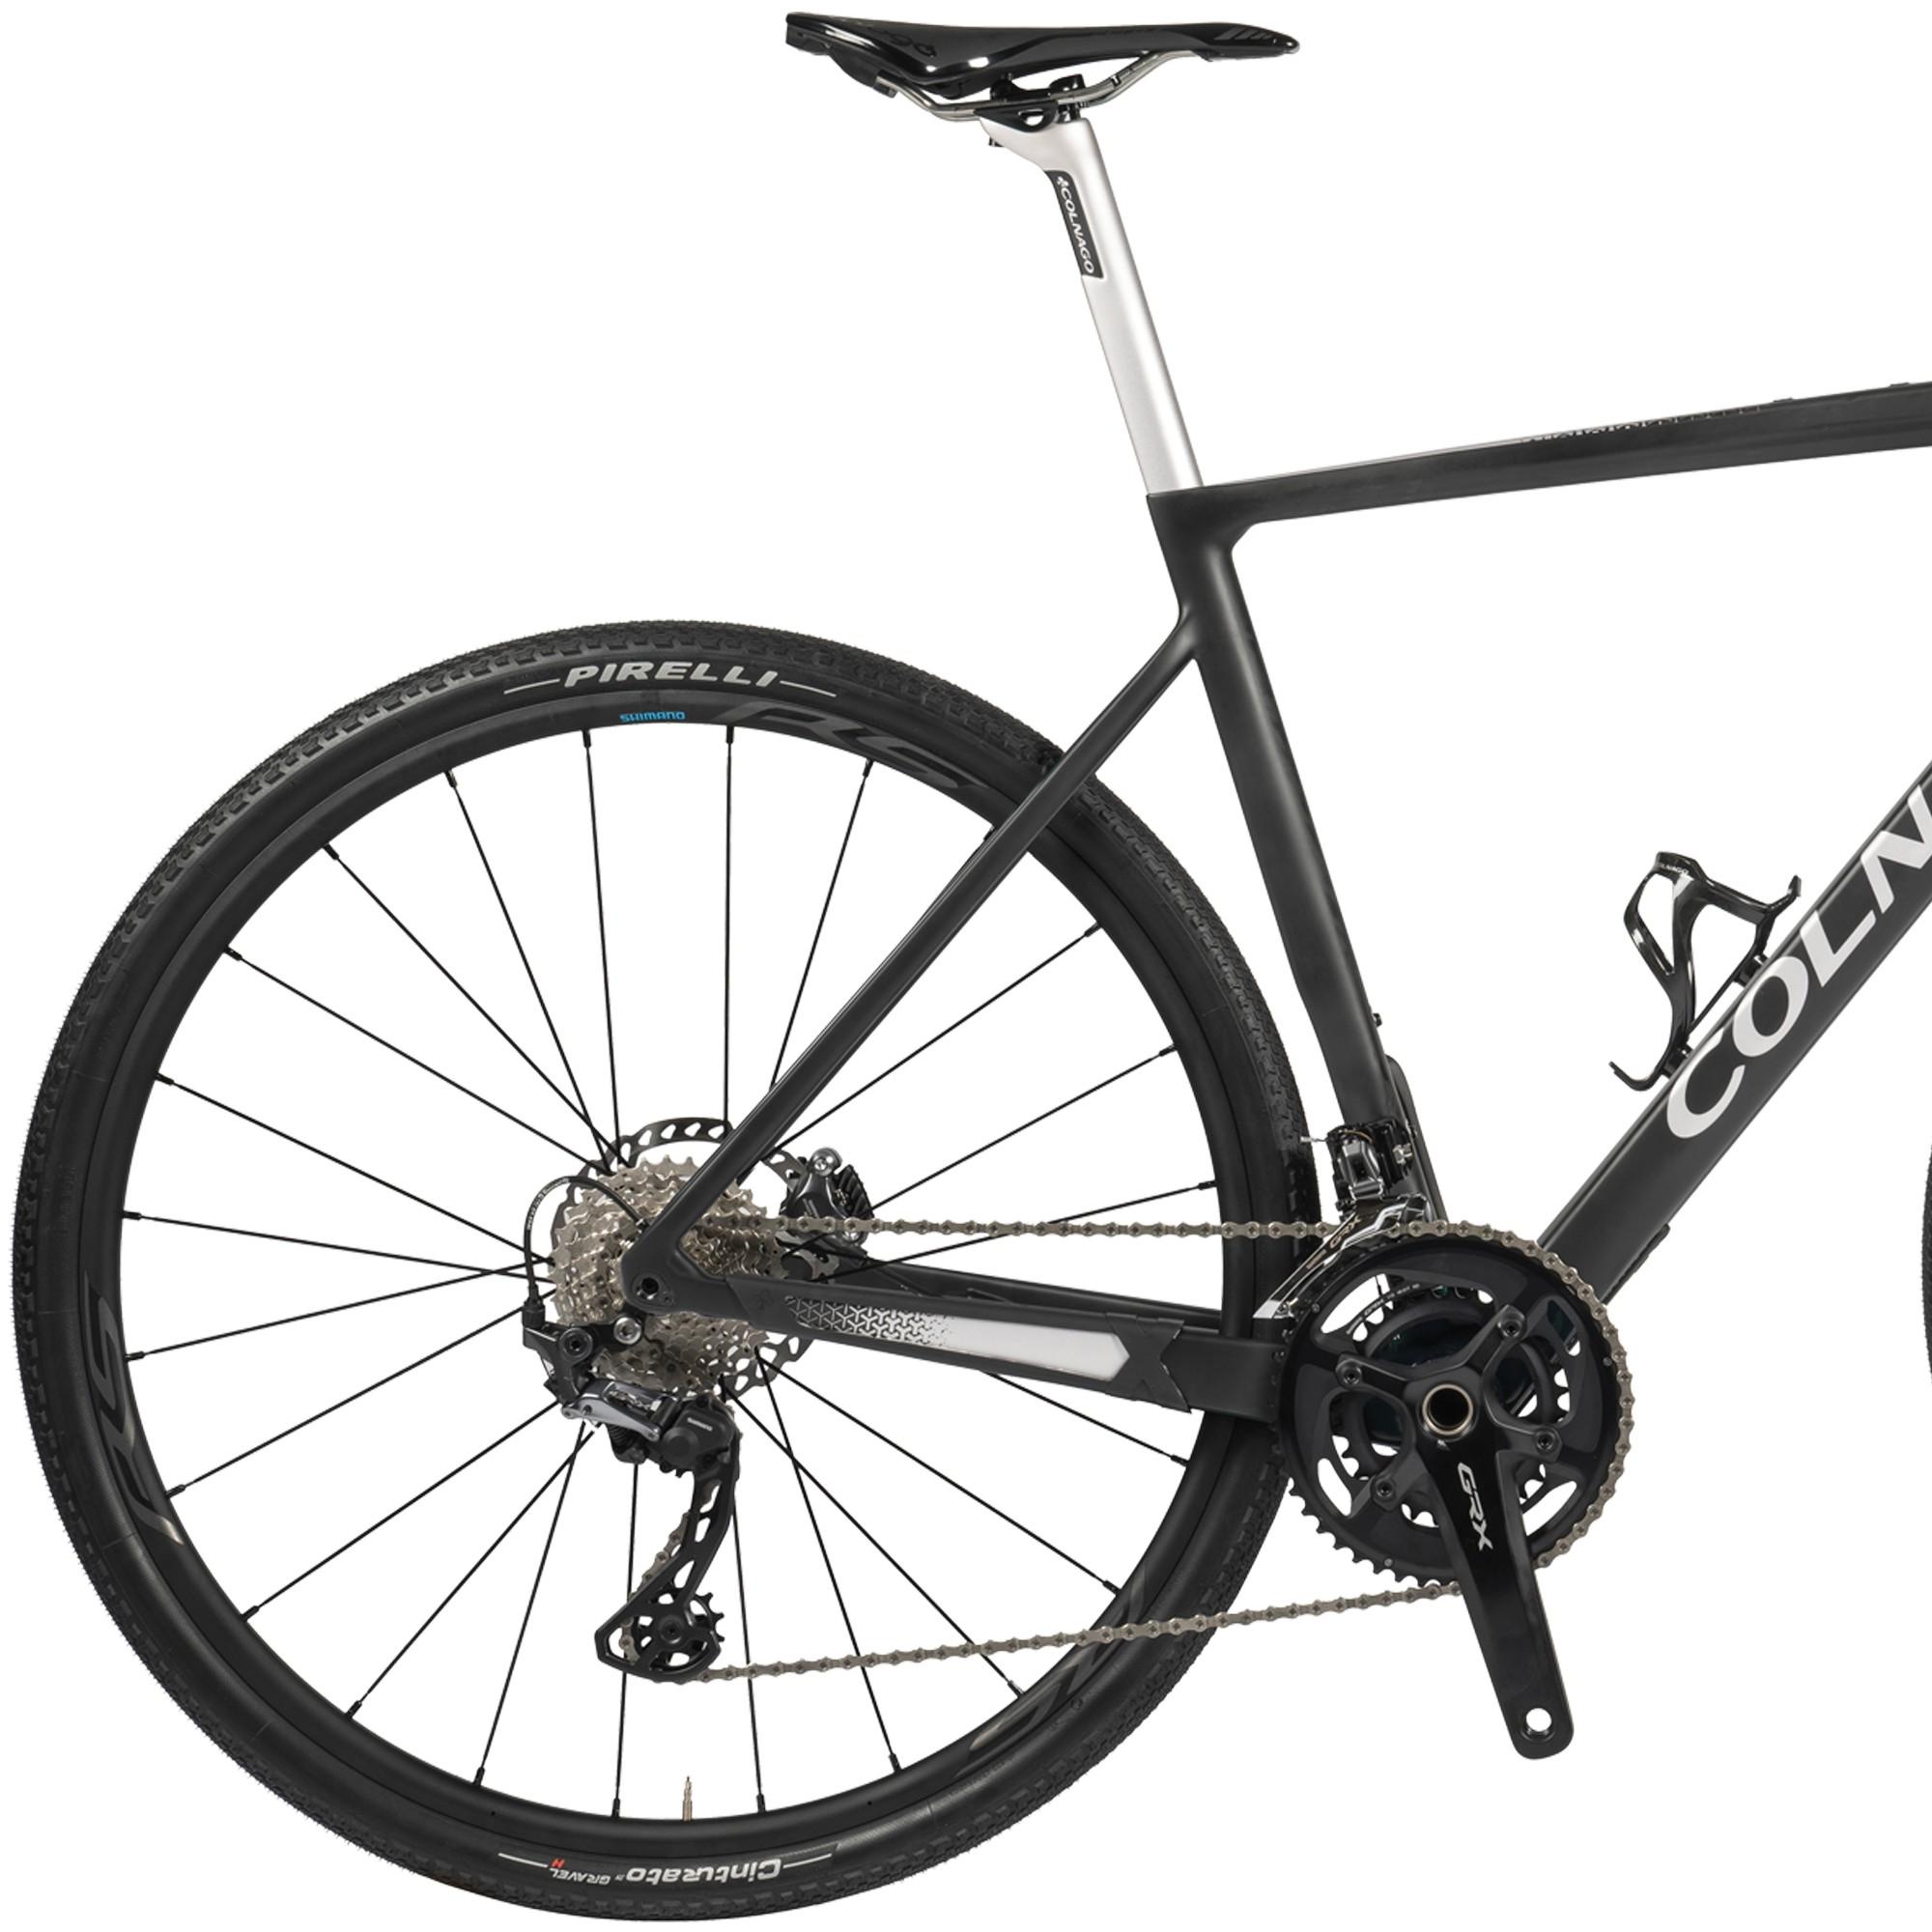 Colnago-G3X-Disc-Adventure-Road-Bike-2020-Carbon-Black-White - 1